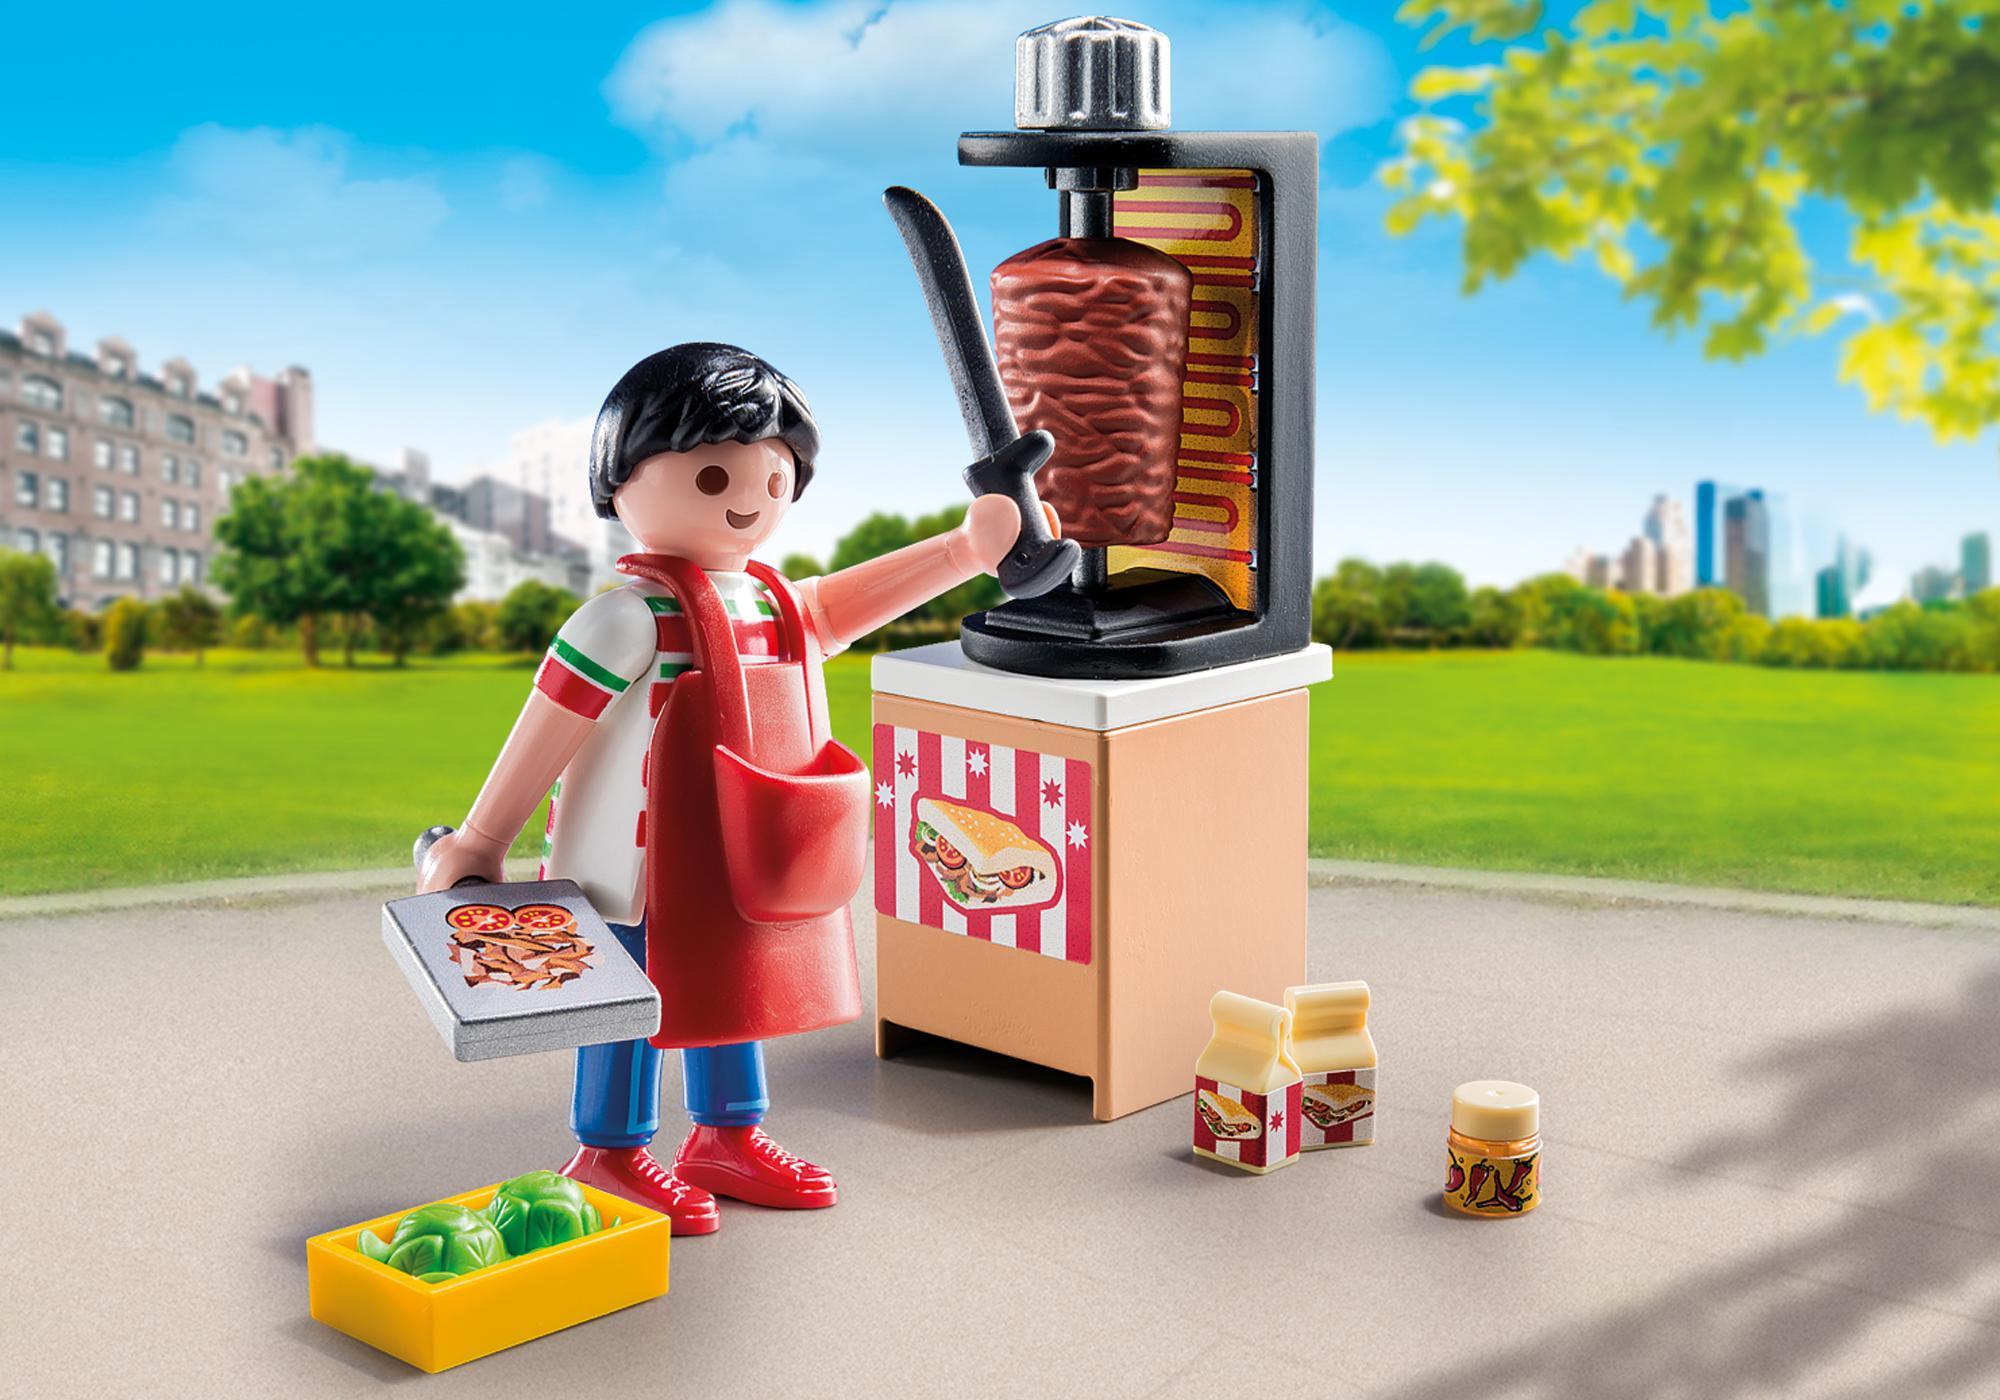 http://media.playmobil.com/i/playmobil/9088_product_detail/Kebab Vendor